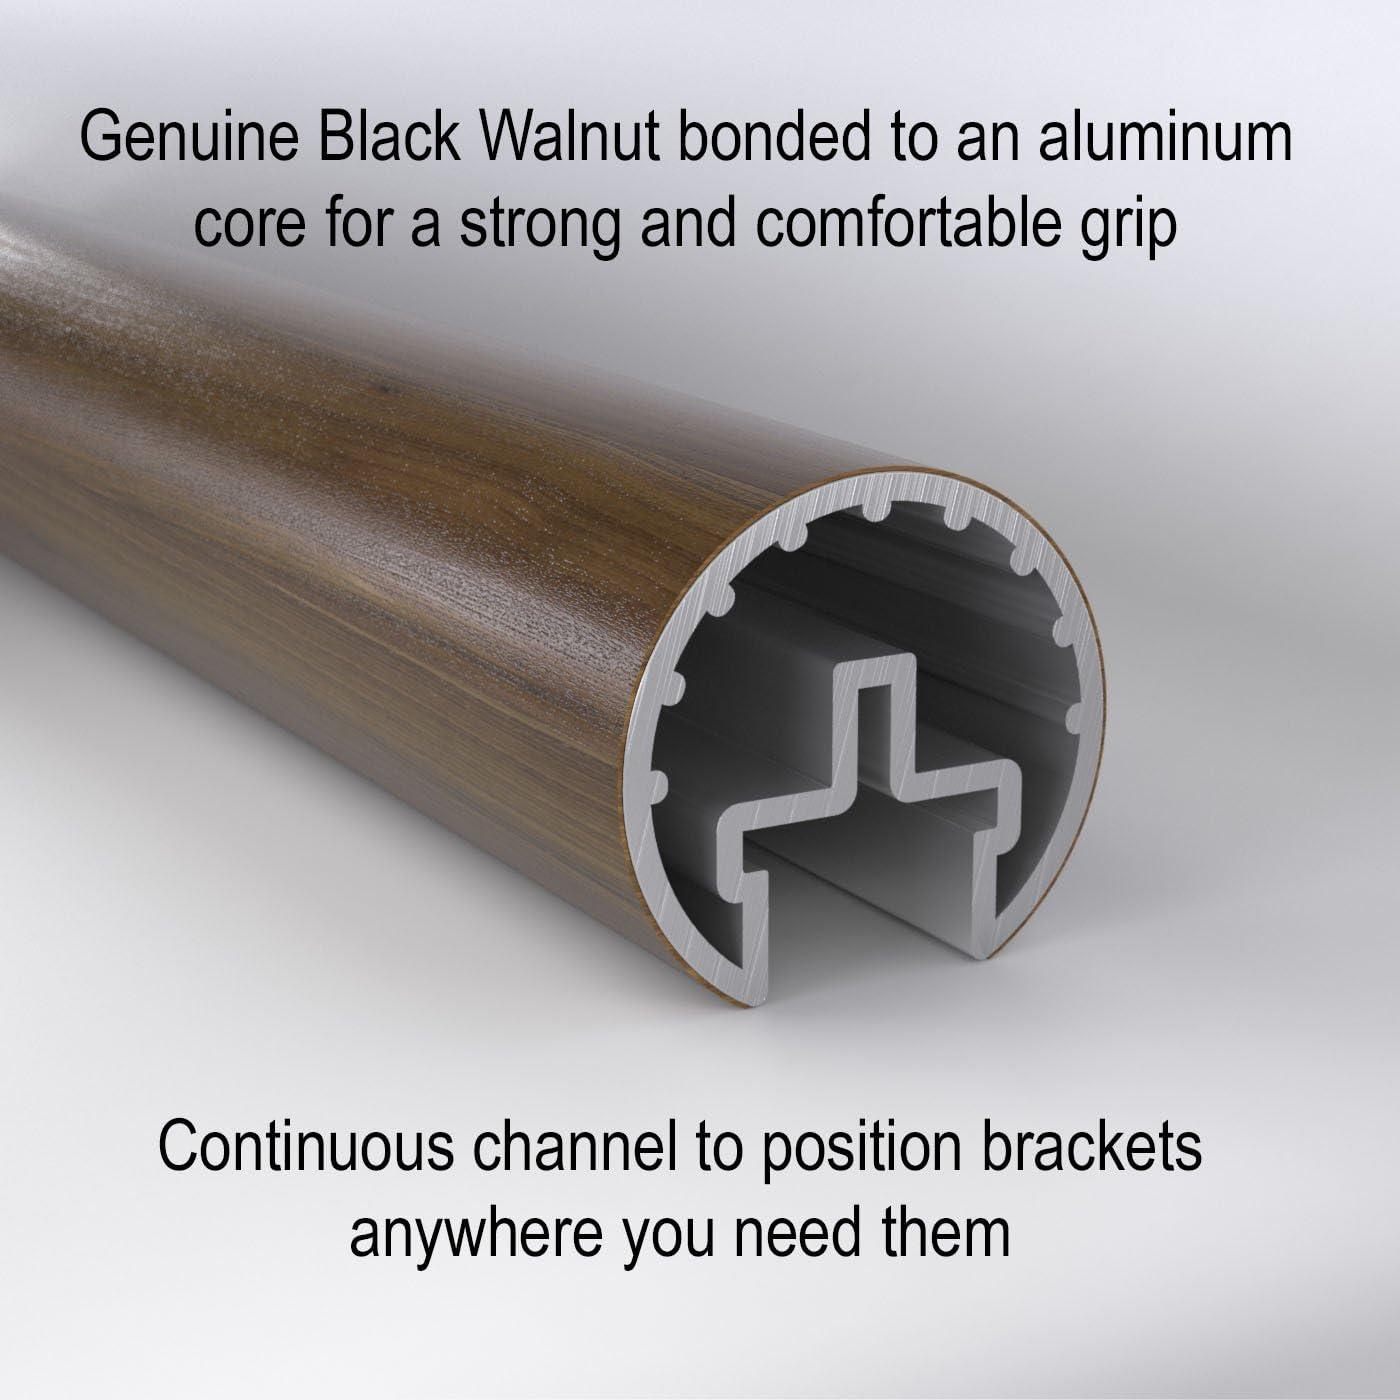 "1.6 Round Handrail 4 ft Genuine Black Walnut bonded to Aluminum core 3 Antique Brass Brackets TOTAL LENGTH: 53/"" Complete Kit ADA Wall Return Endcaps"